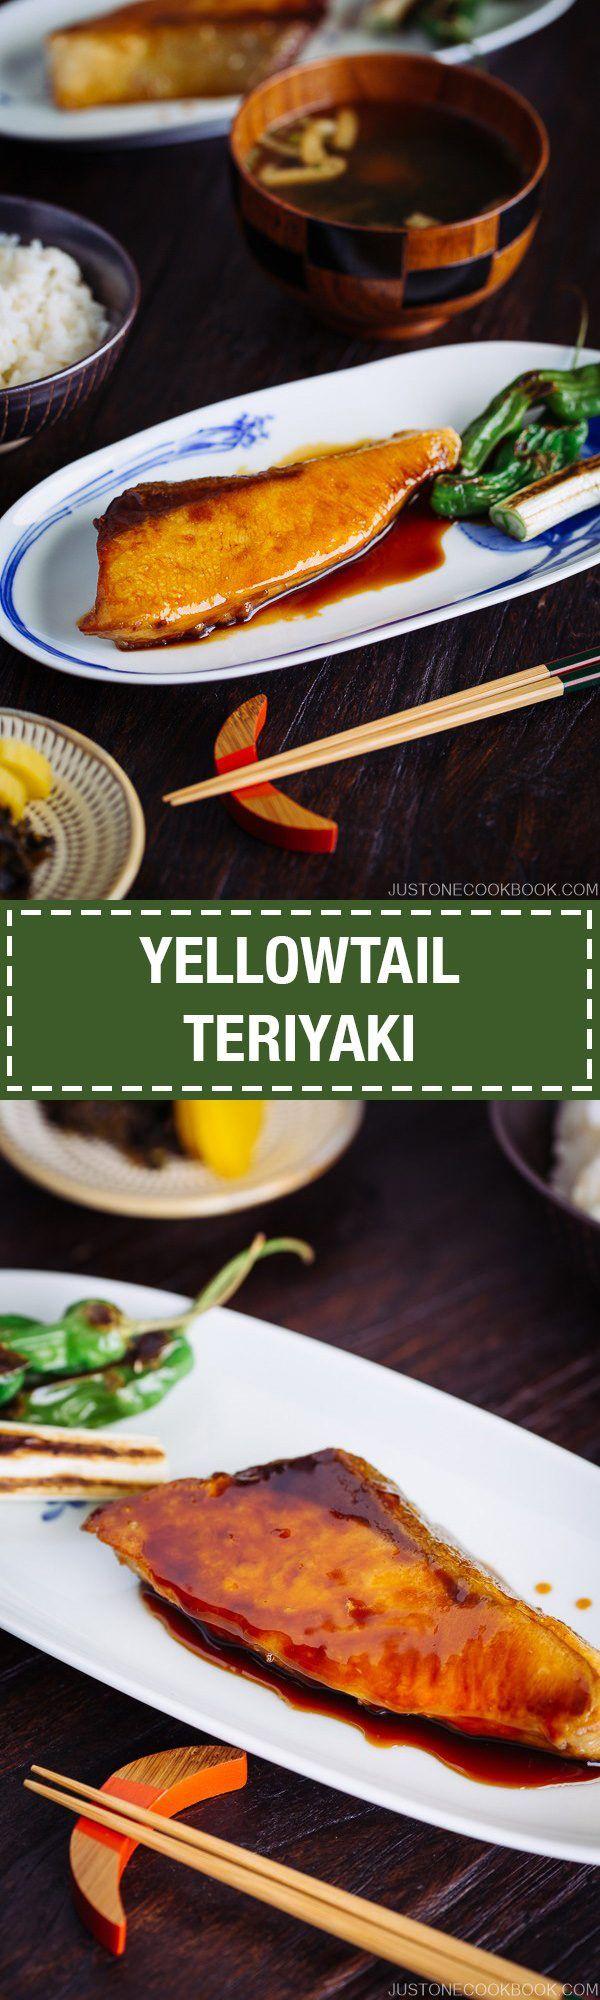 Yellowtail Teriyaki ぶりの照り焼き • Just One Cookbook